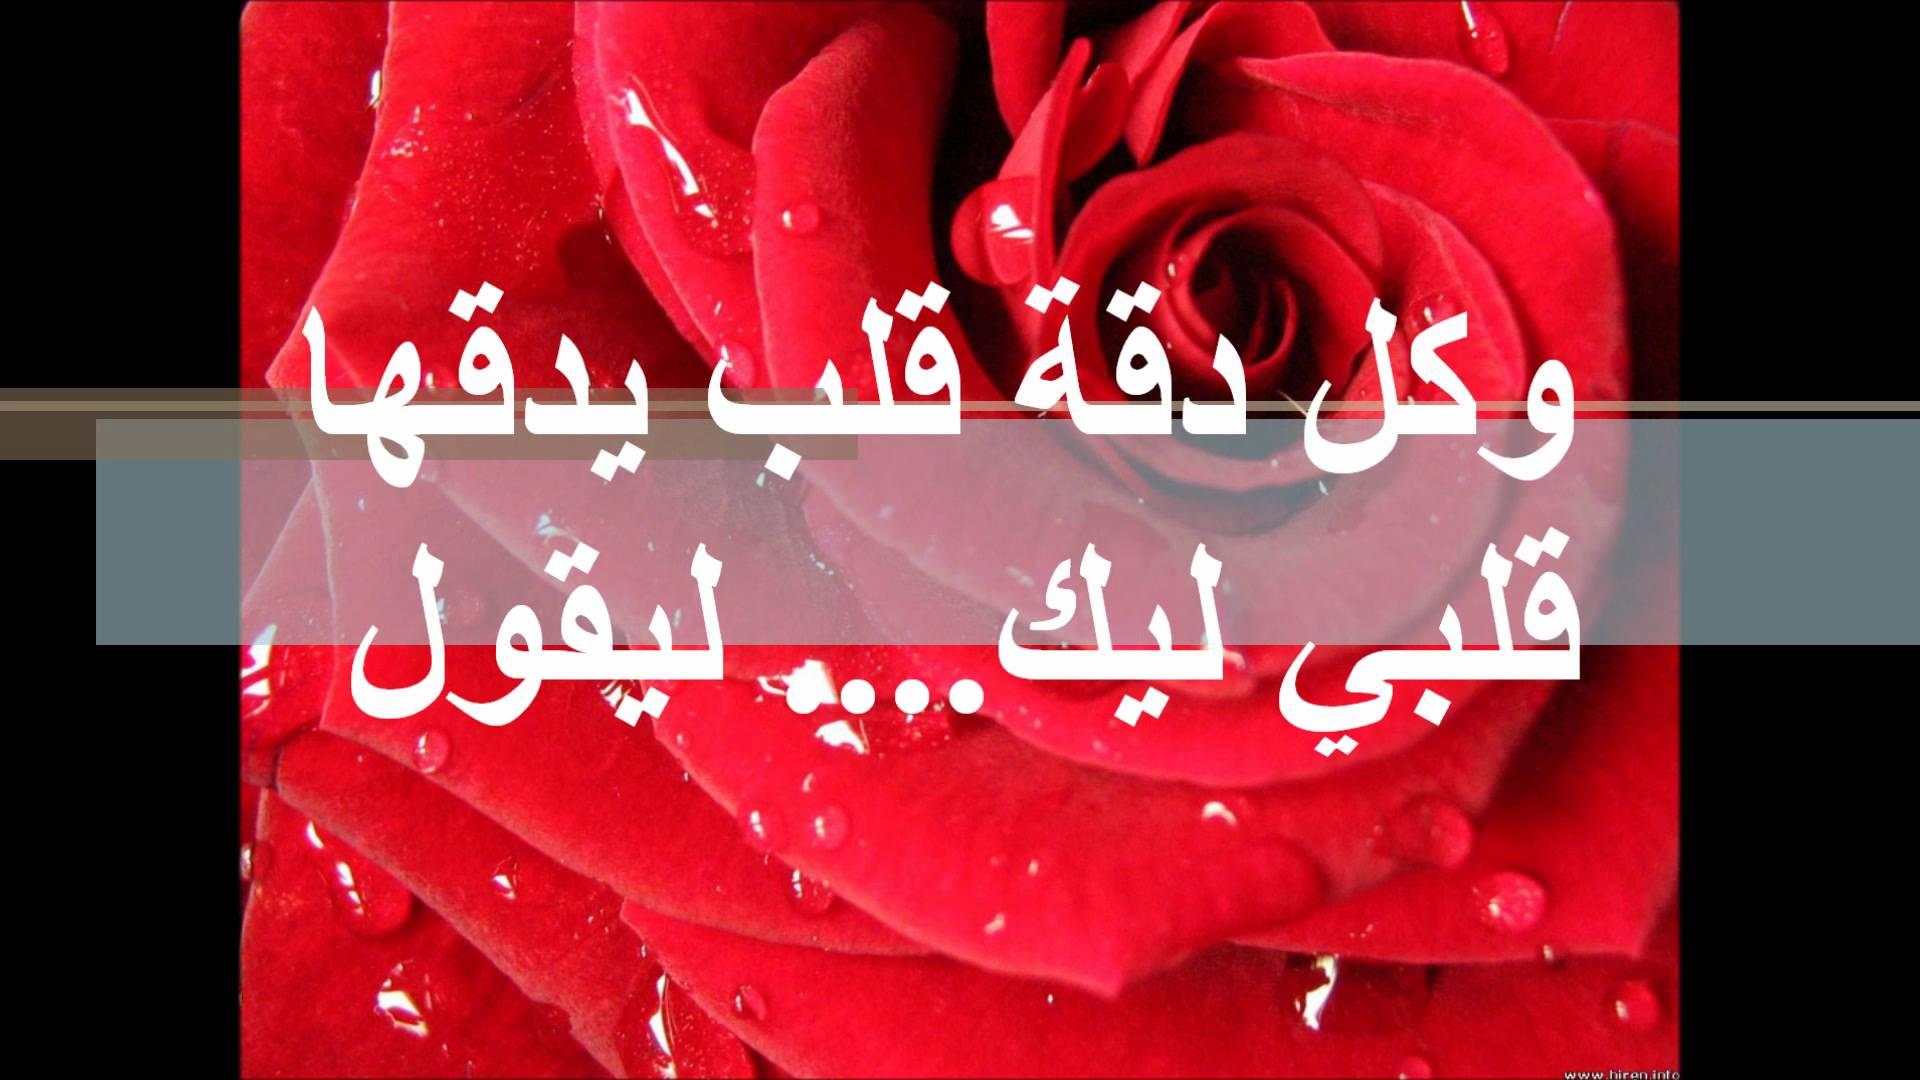 بالصور شعر مغربي جميل جدا 20160711 2151